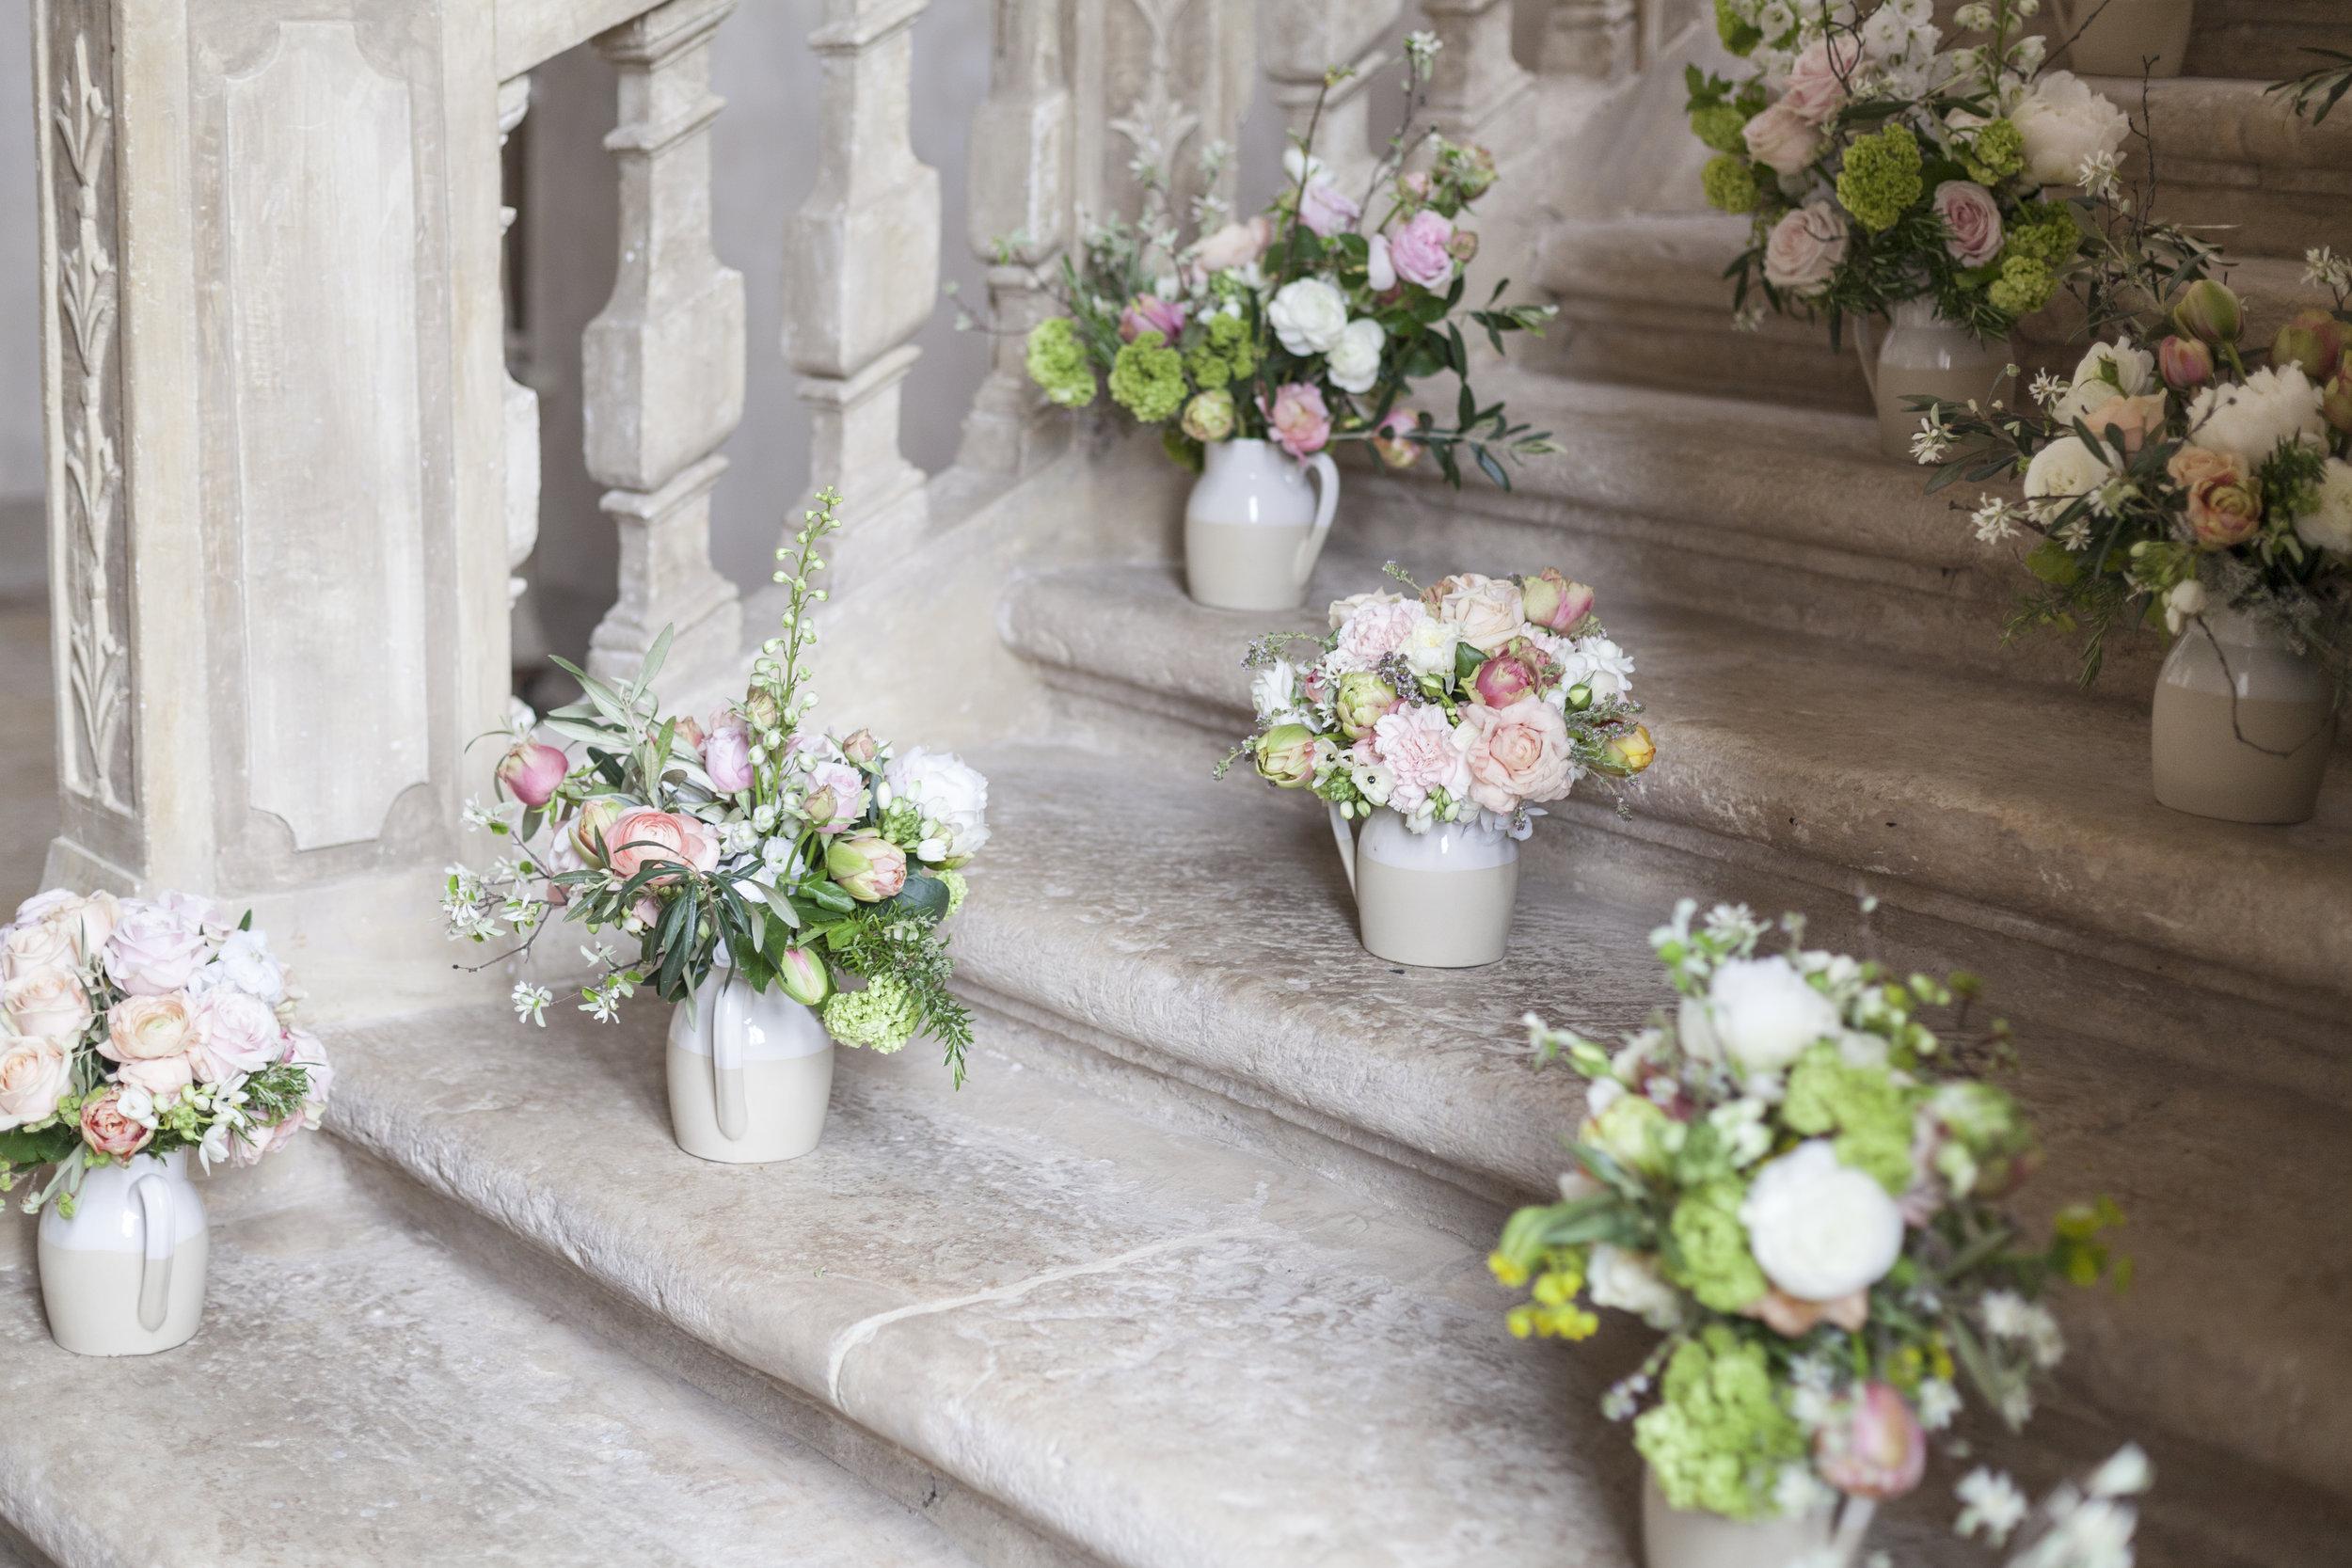 france-provence-floral-workshop-sandra-sigman-sharon-santoni (4).jpg